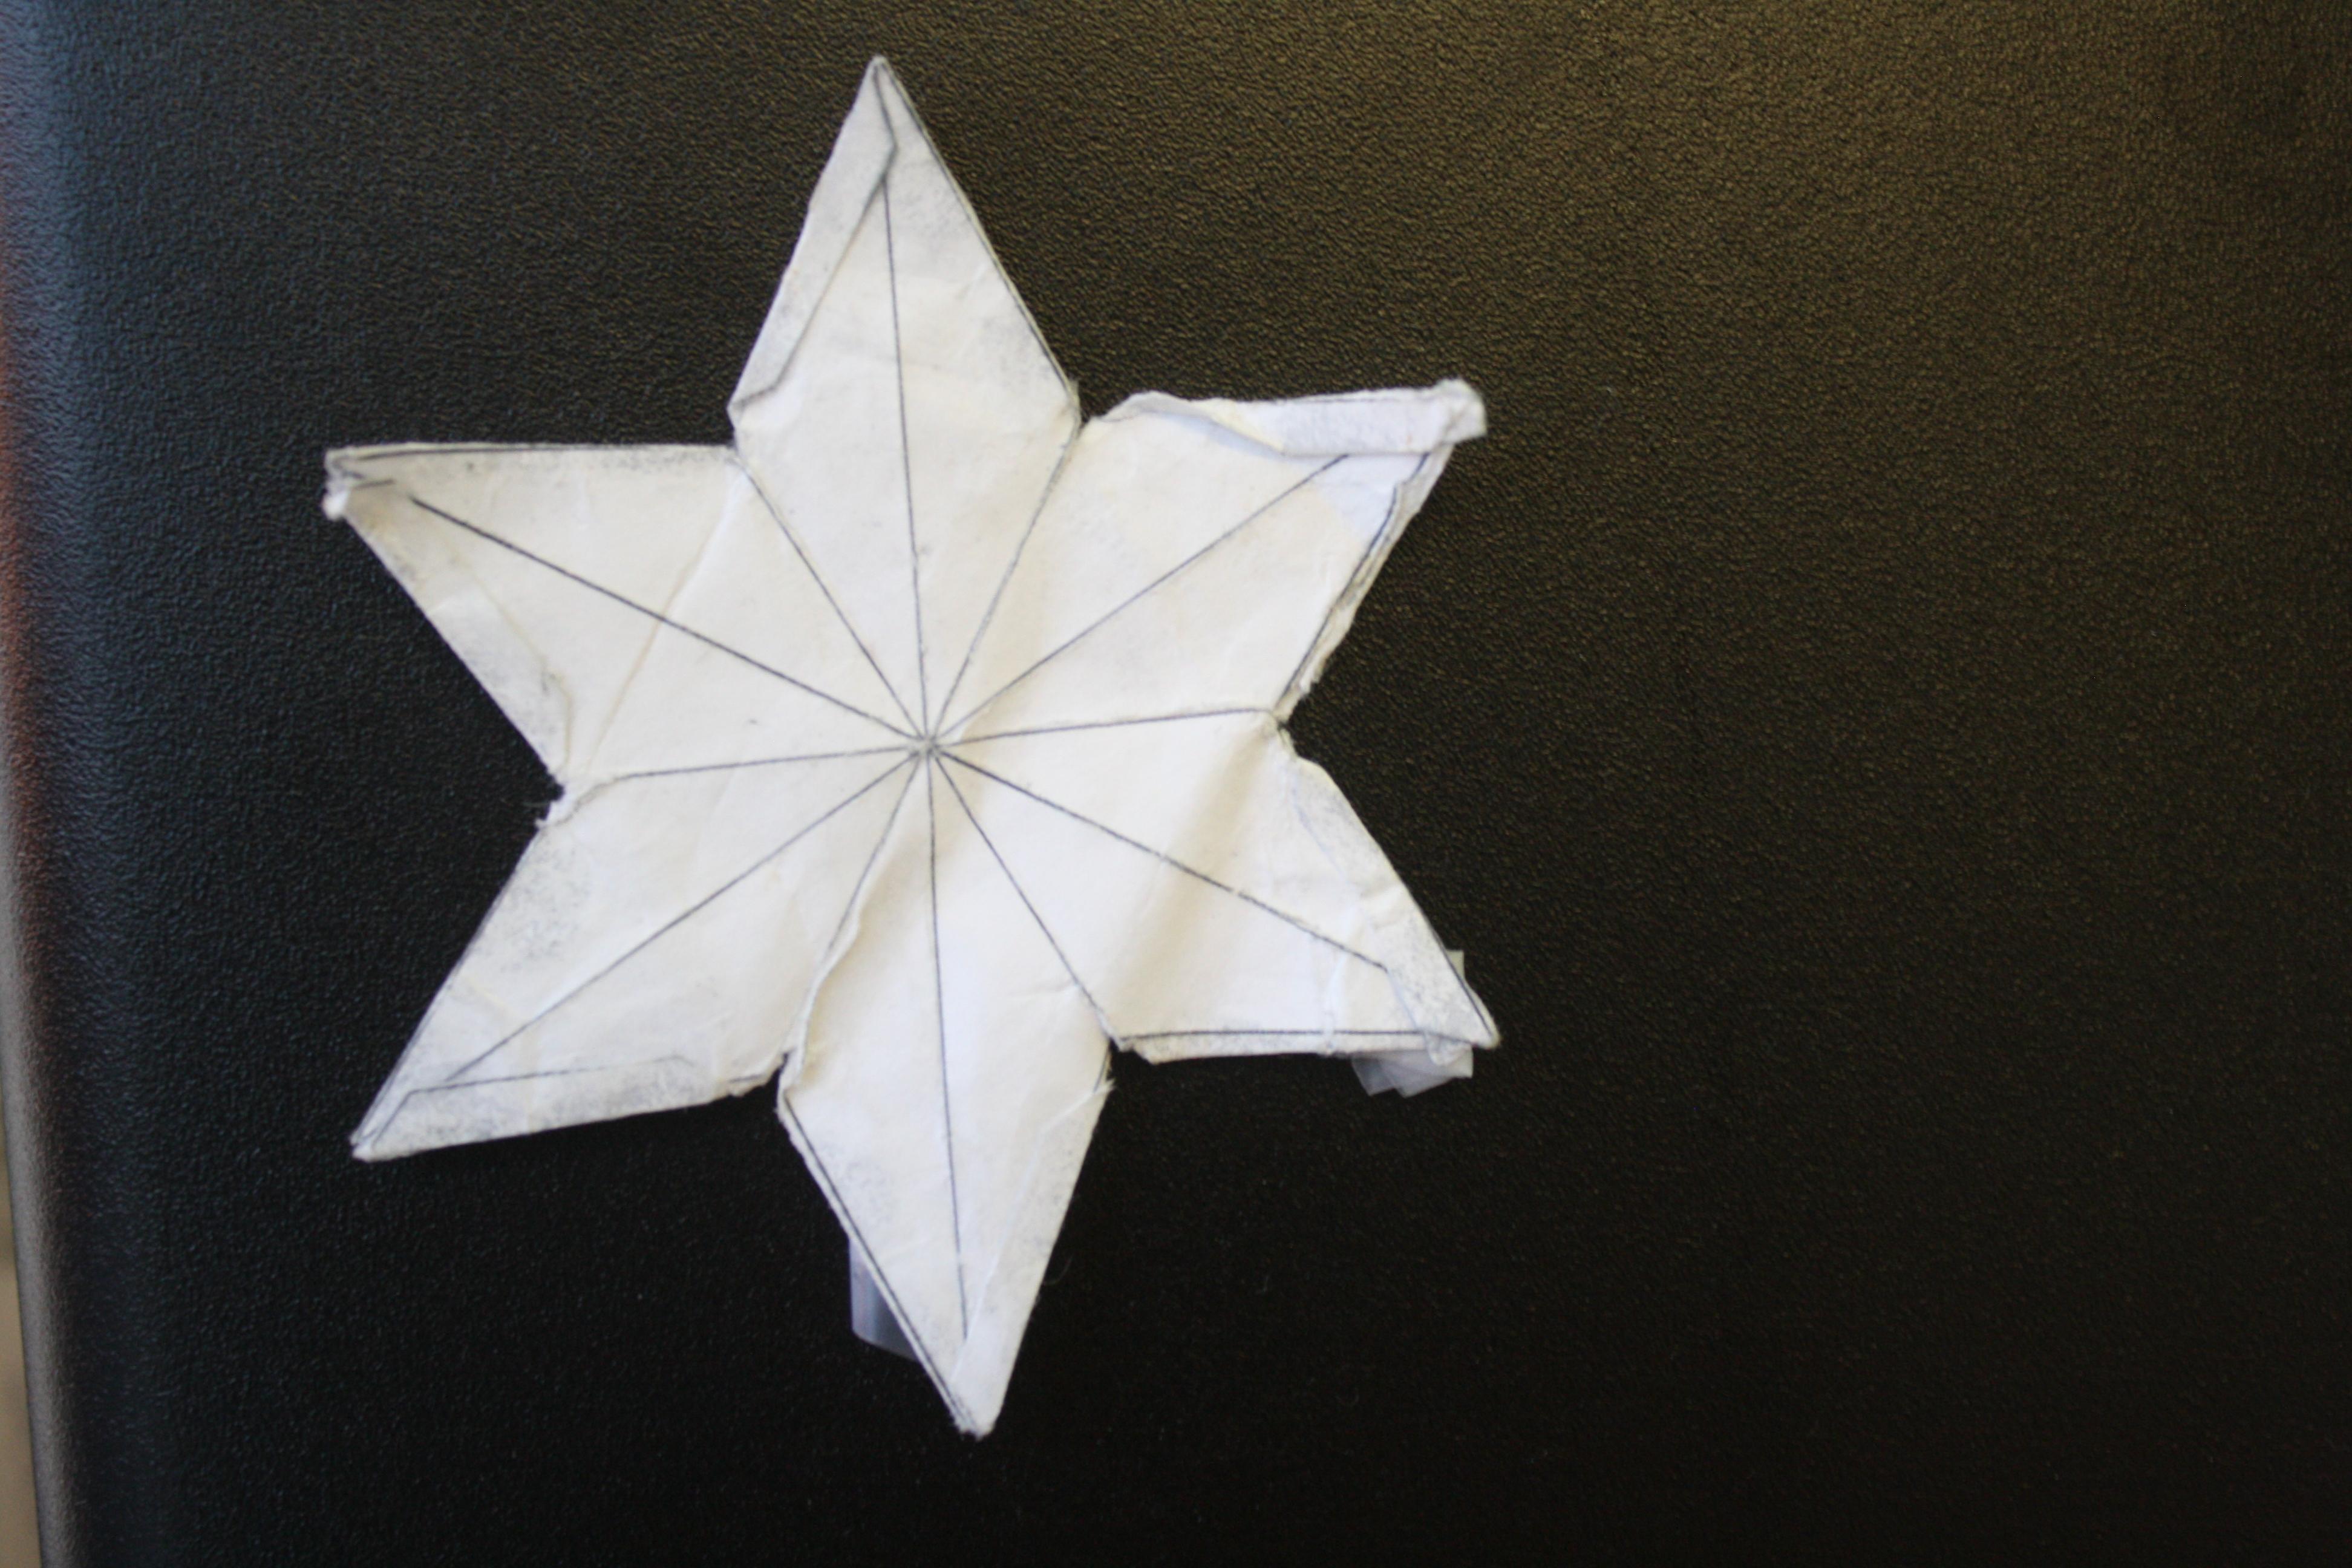 3-D Media Studio I: Soft Sculpture » Folding - photo#19